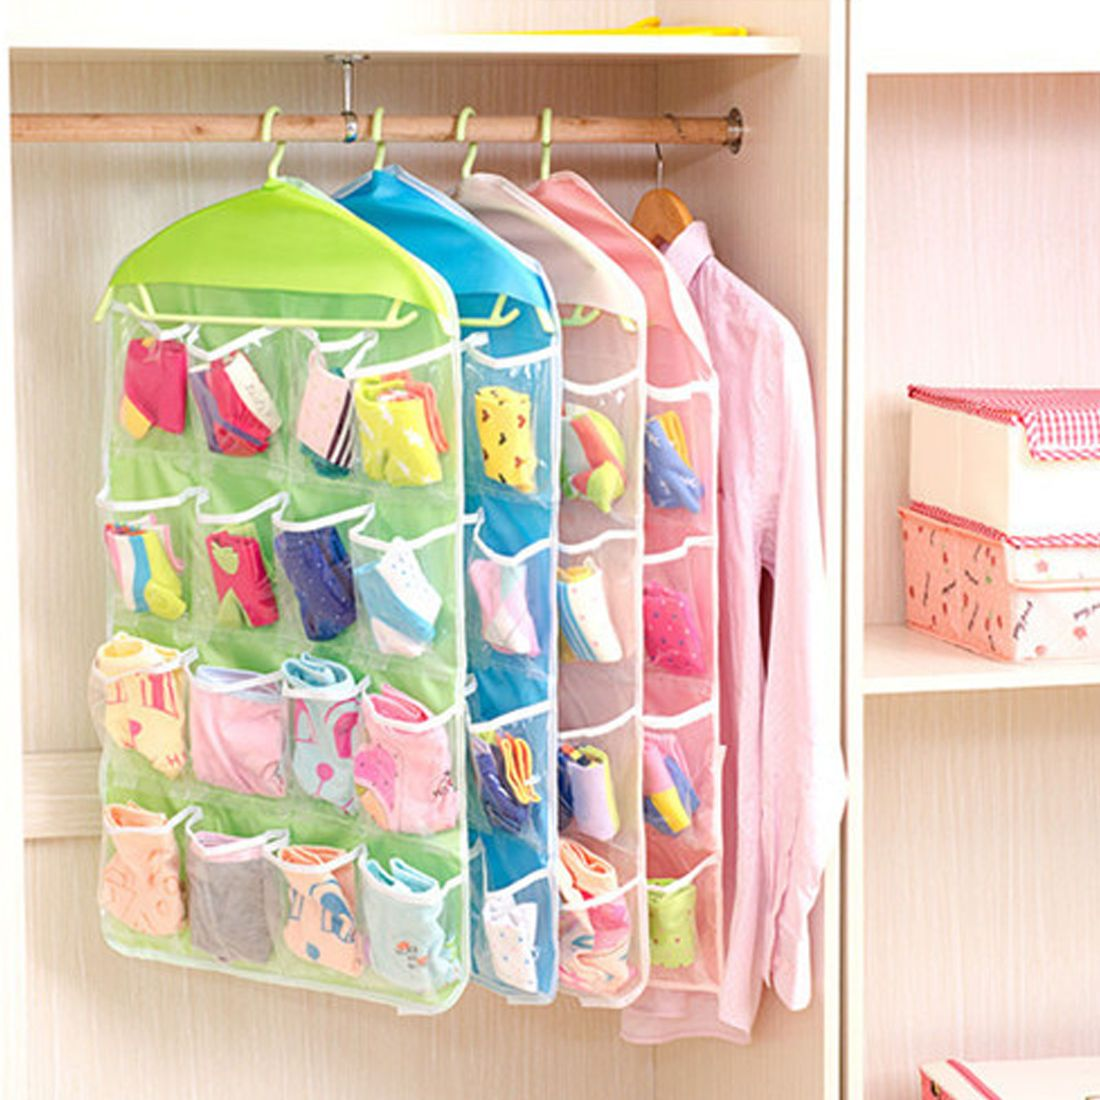 Home Clear Hanging Bag Socks Etc Bra Underwear Rack Hanger Storage Organizer